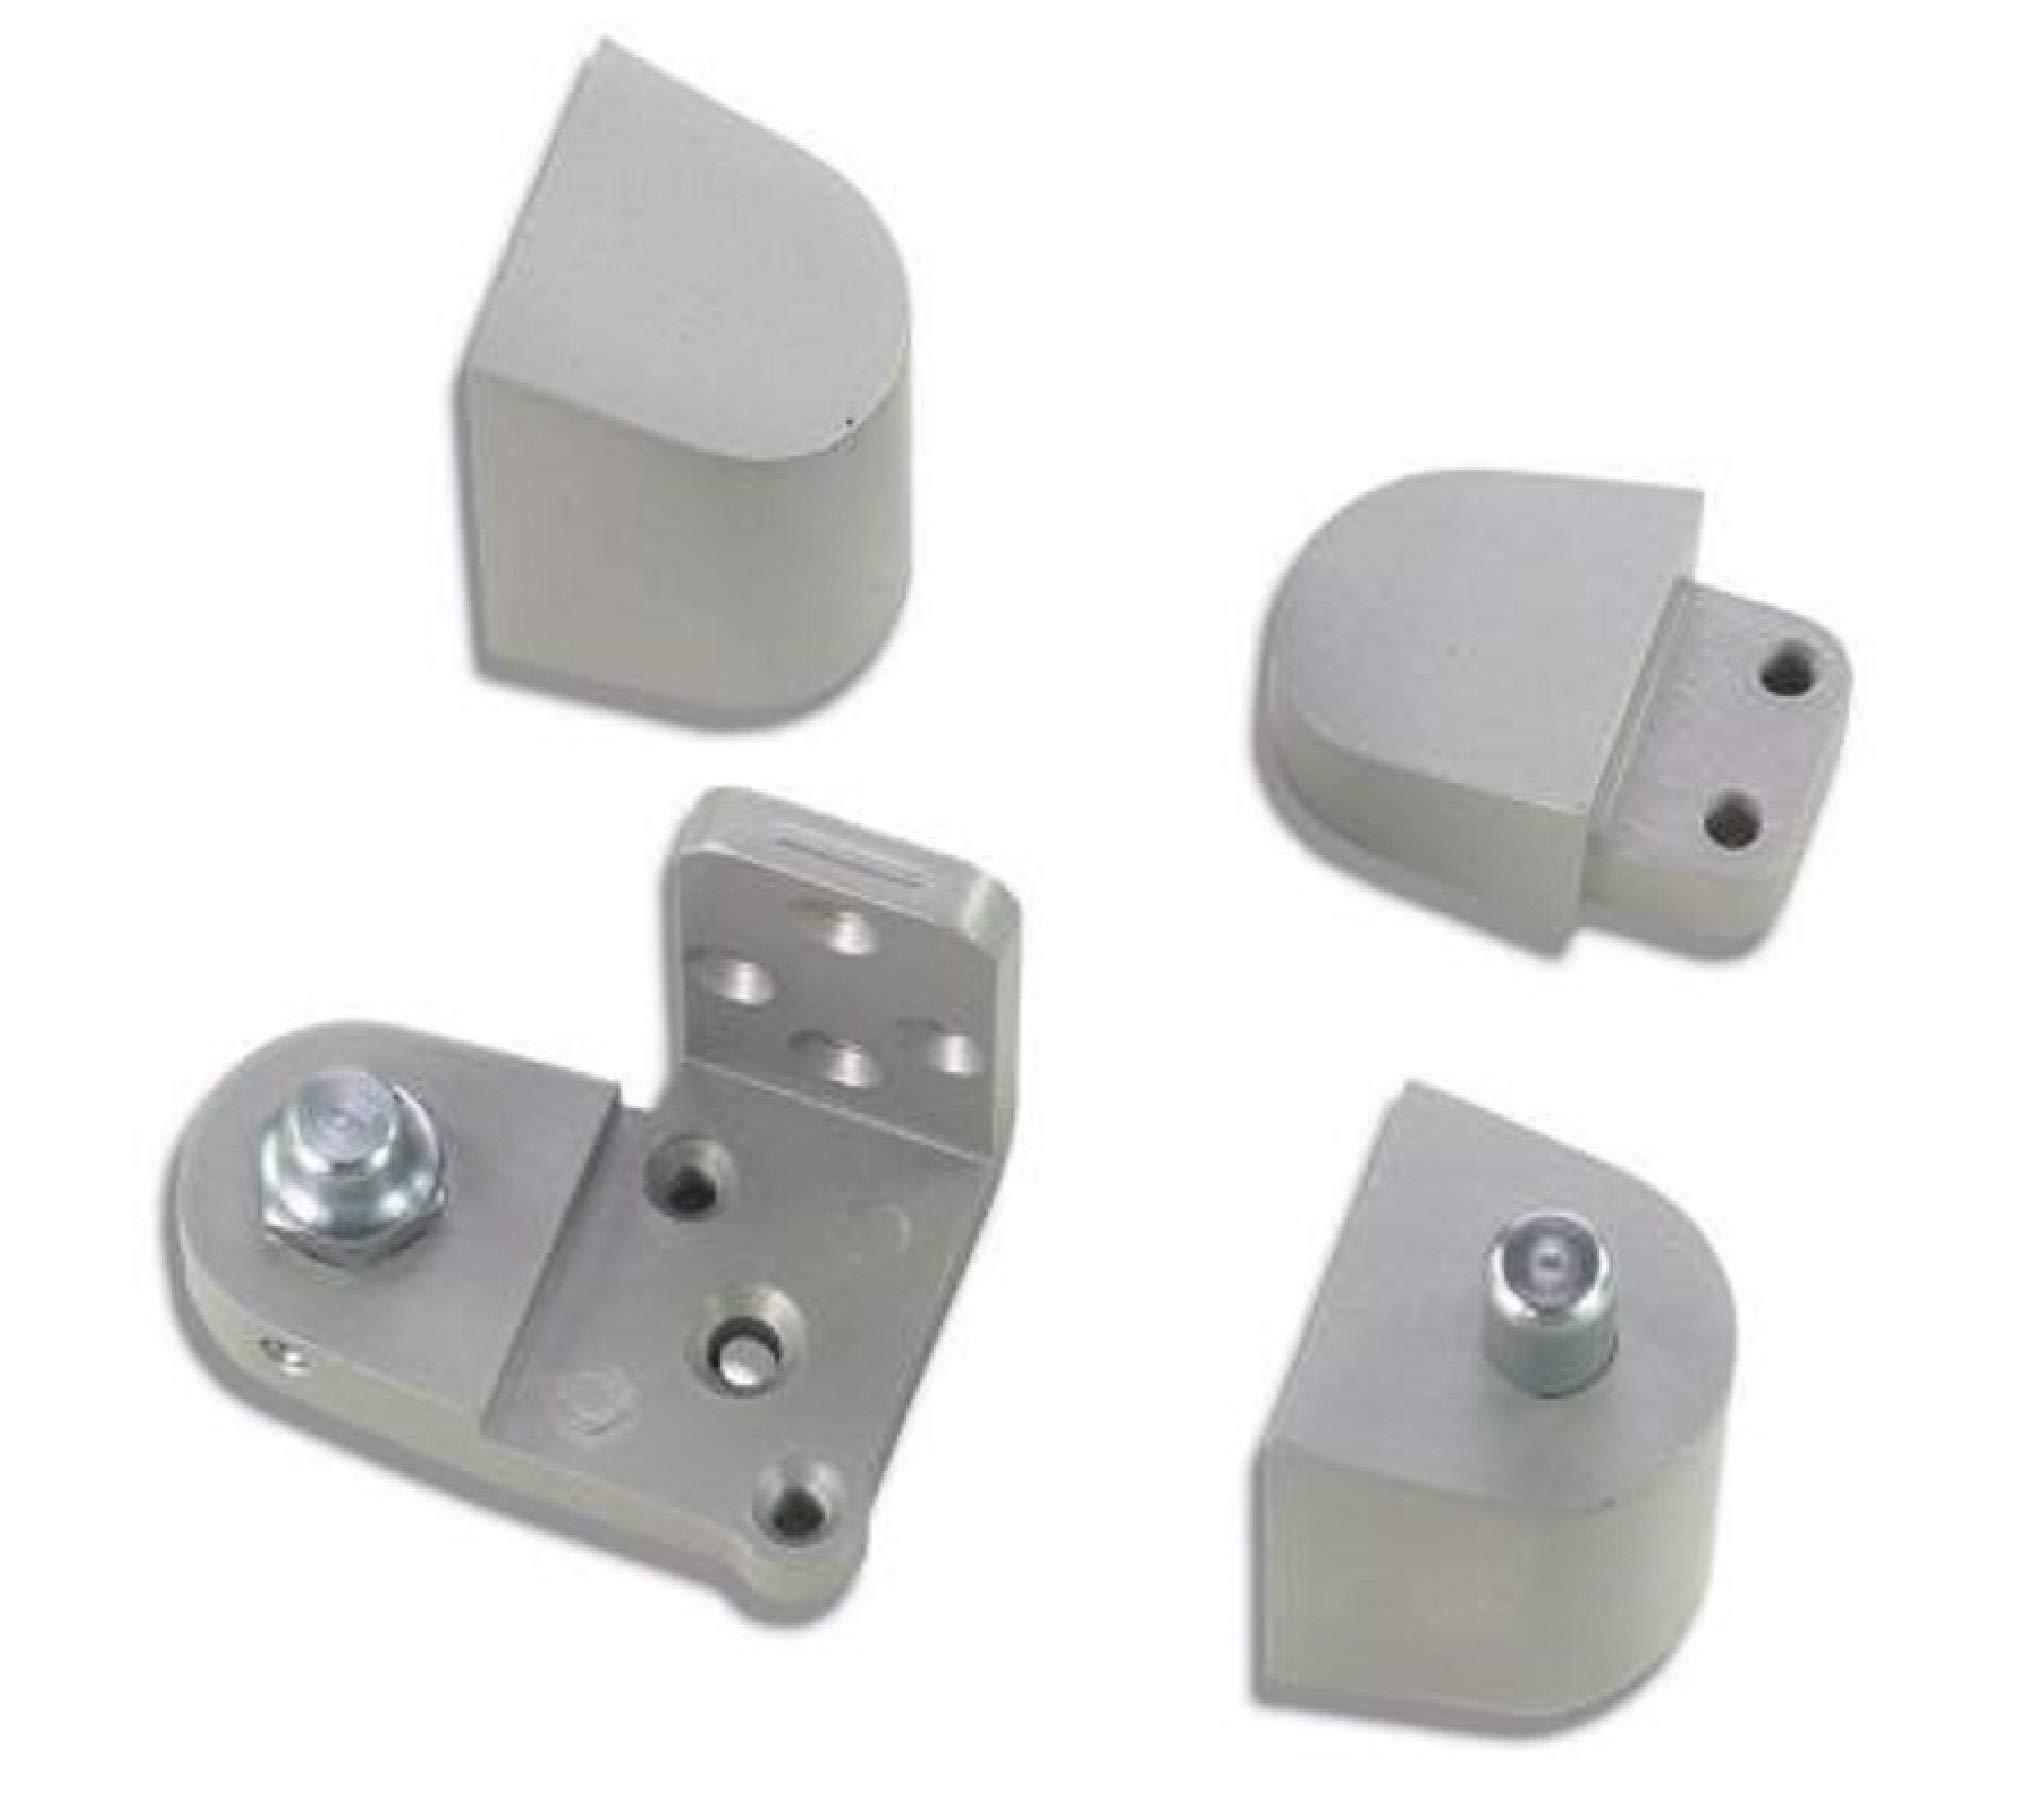 US Aluminum Style Storefront Door Pivot Hinge Set in Aluminum Finish - Choose Handing (Right Hand)